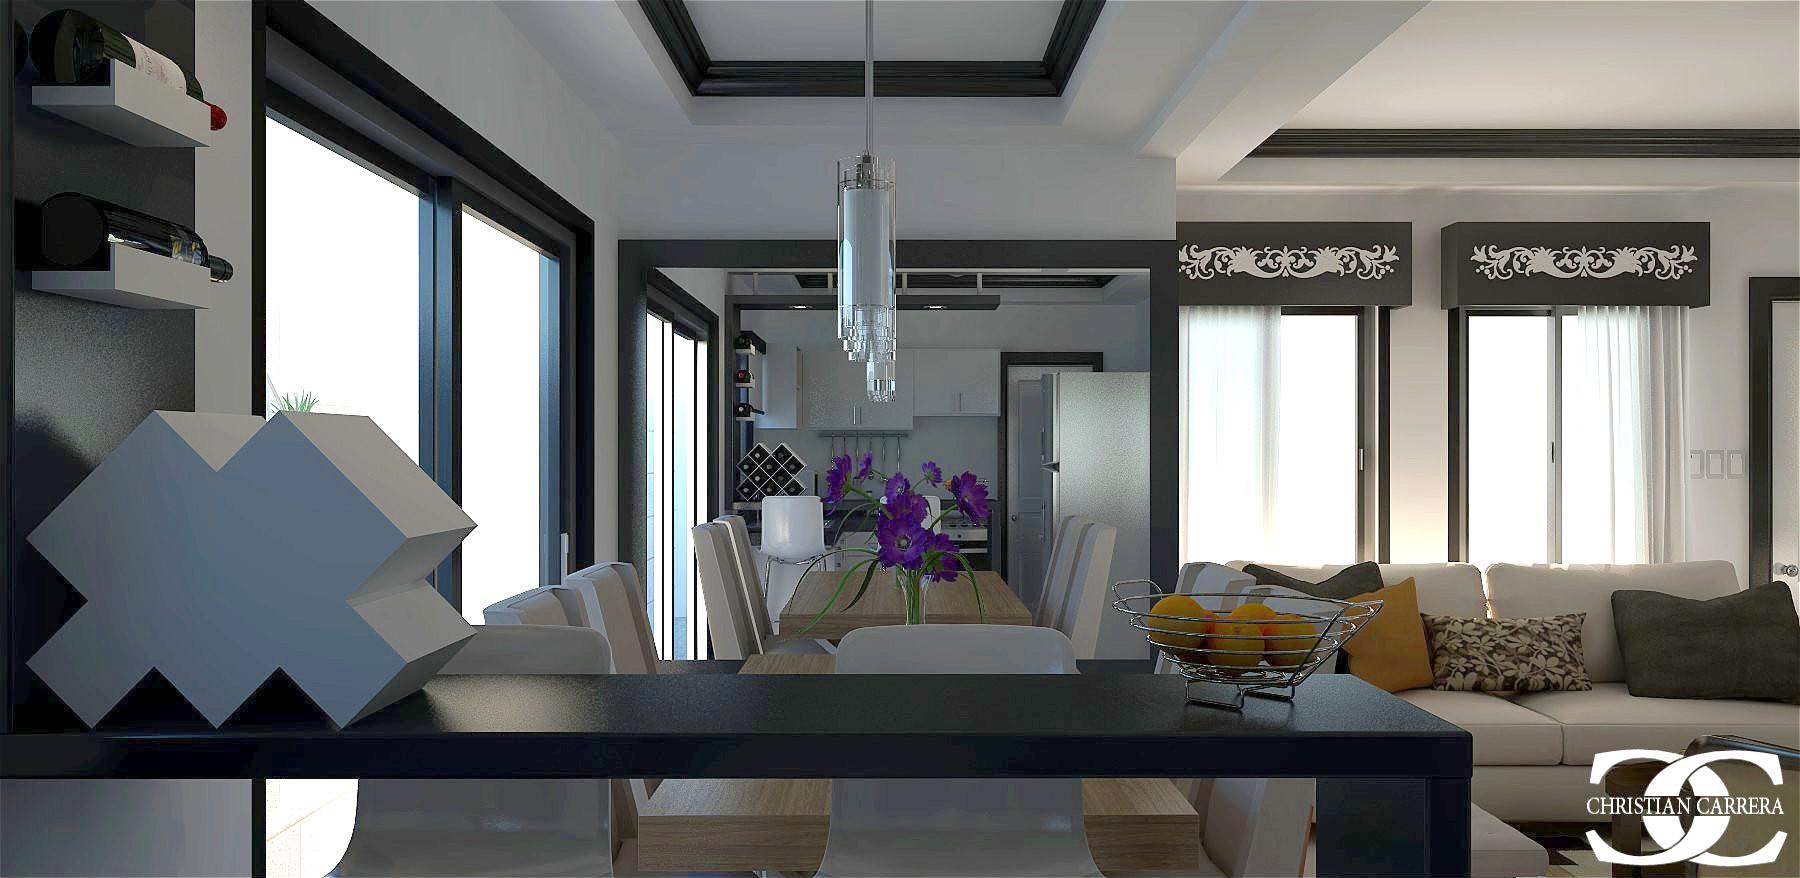 2019 sept 2 storey interior argona ground floor 05 mark-lighter.jpg